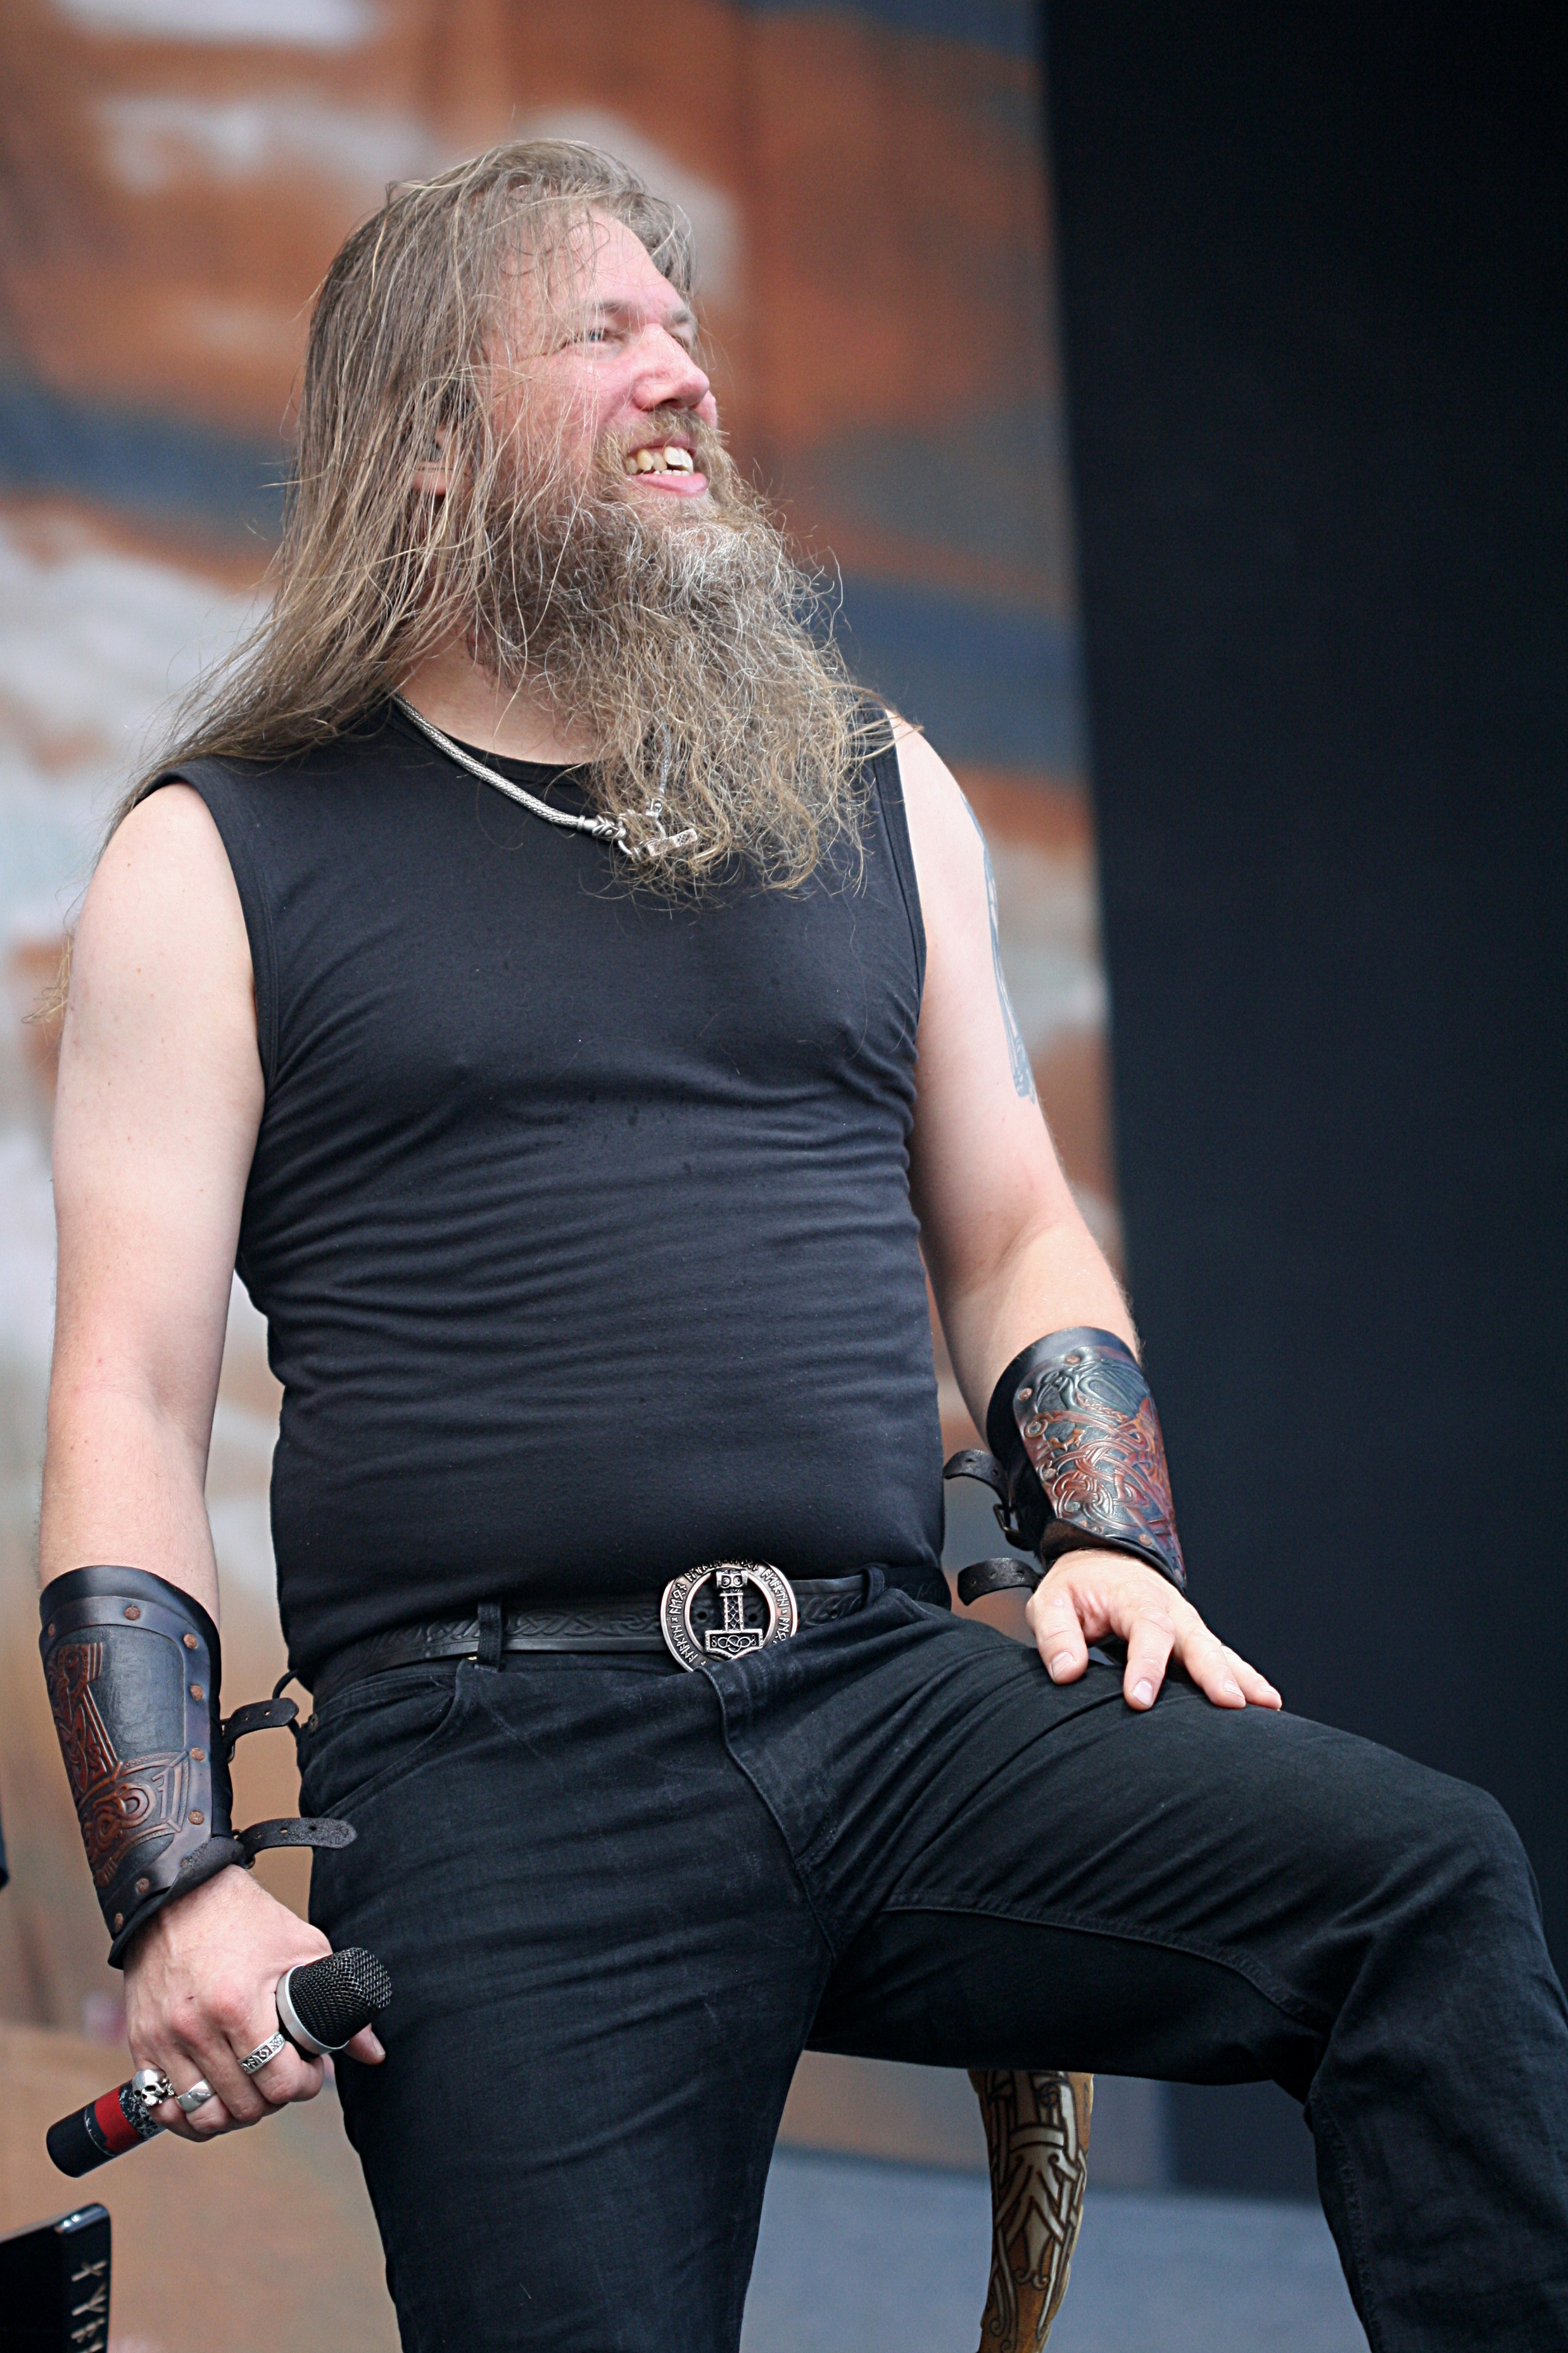 Johan Hegg